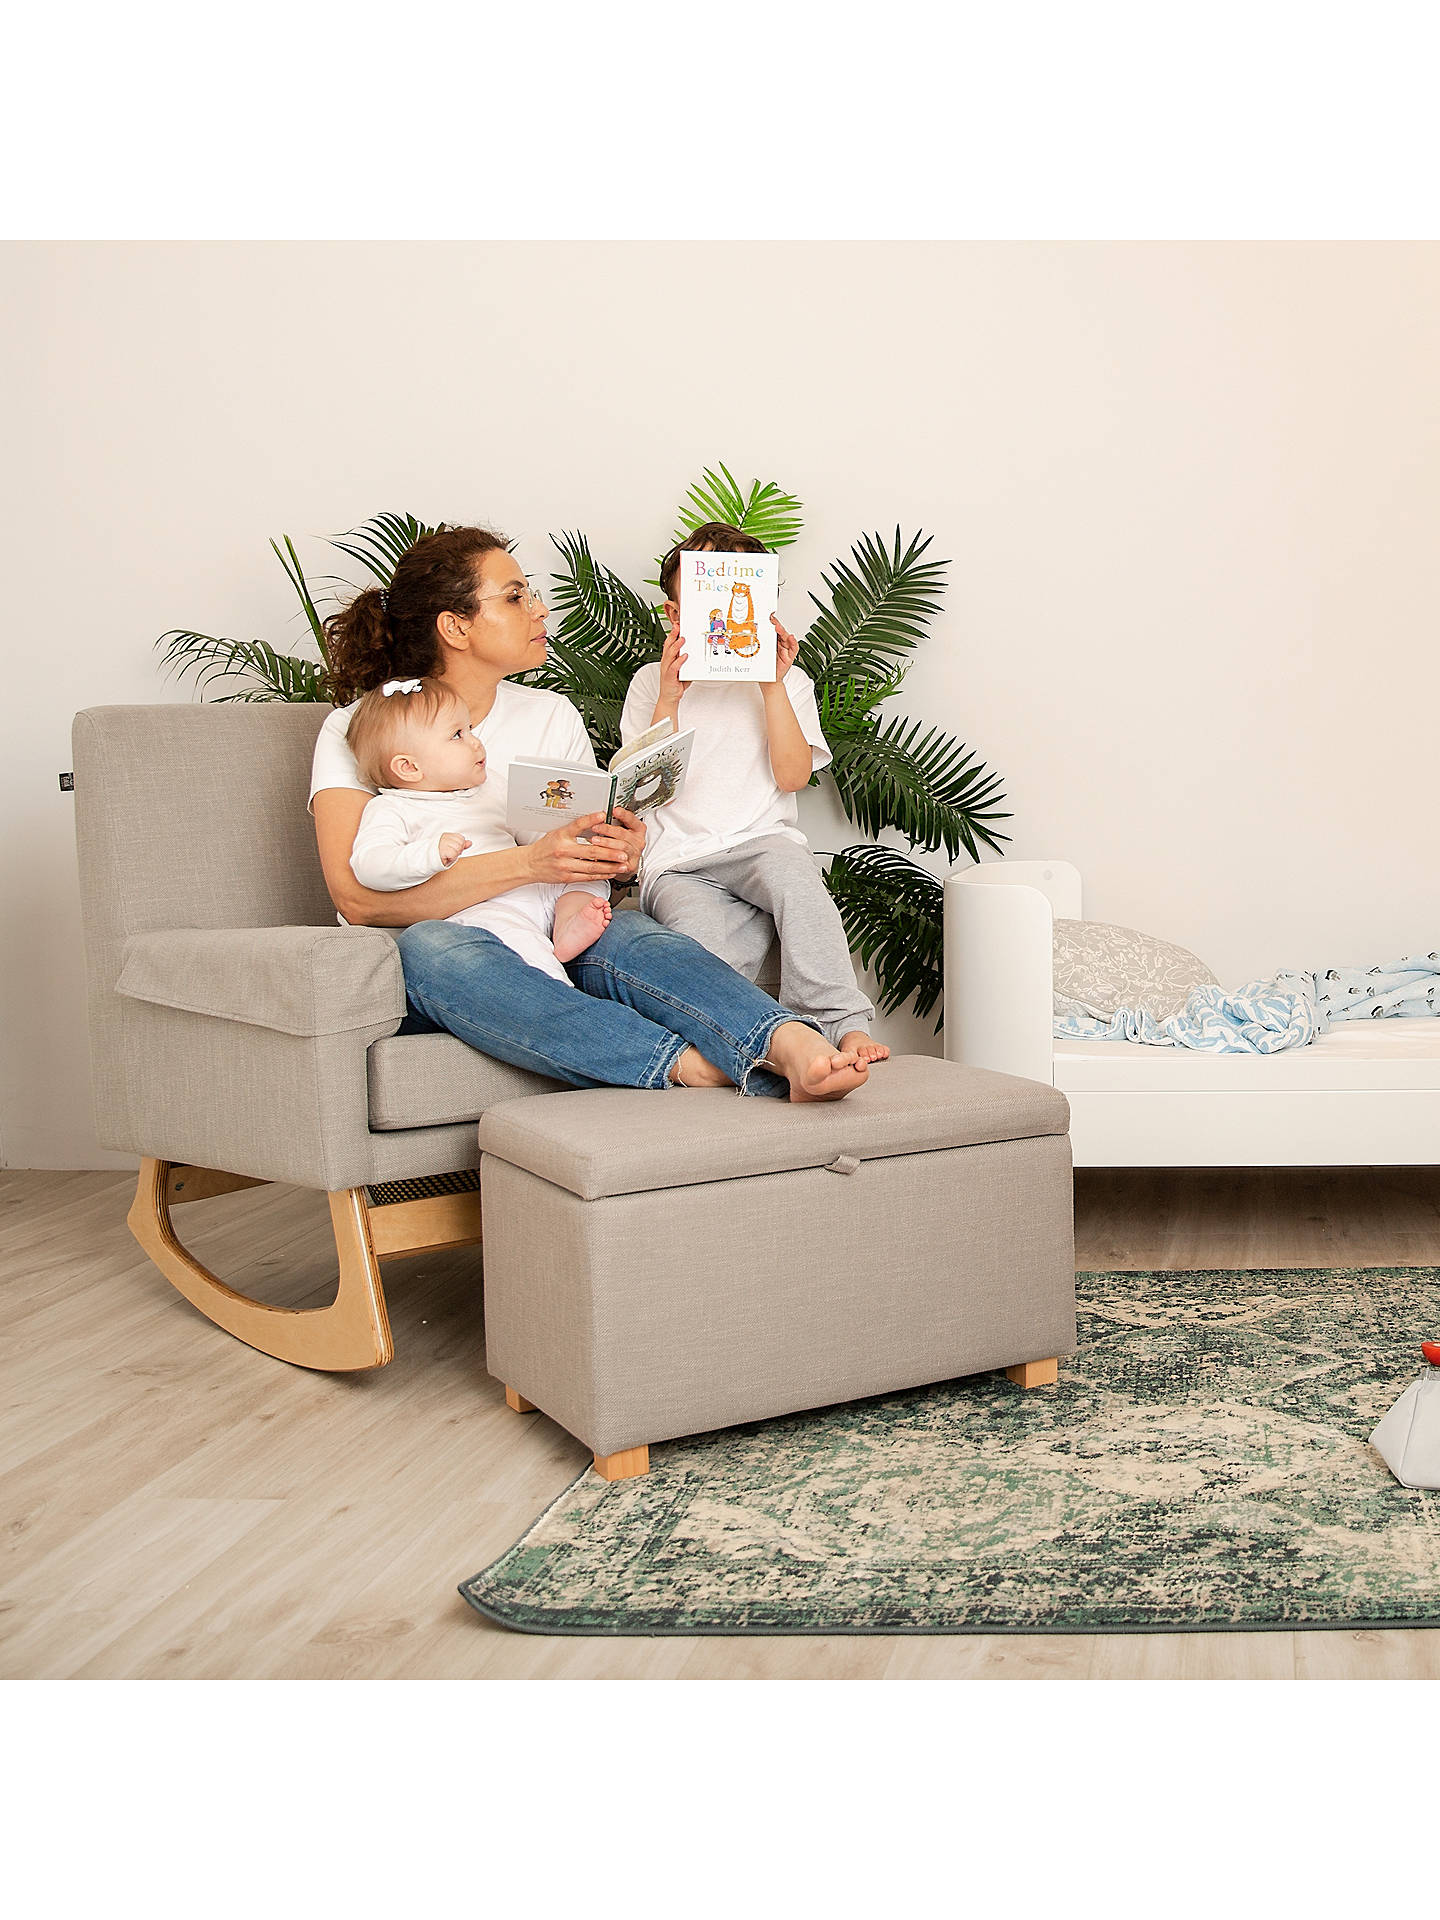 Tremendous Gaia Baby Serena Nursing Rocking Chair Oat Short Links Chair Design For Home Short Linksinfo